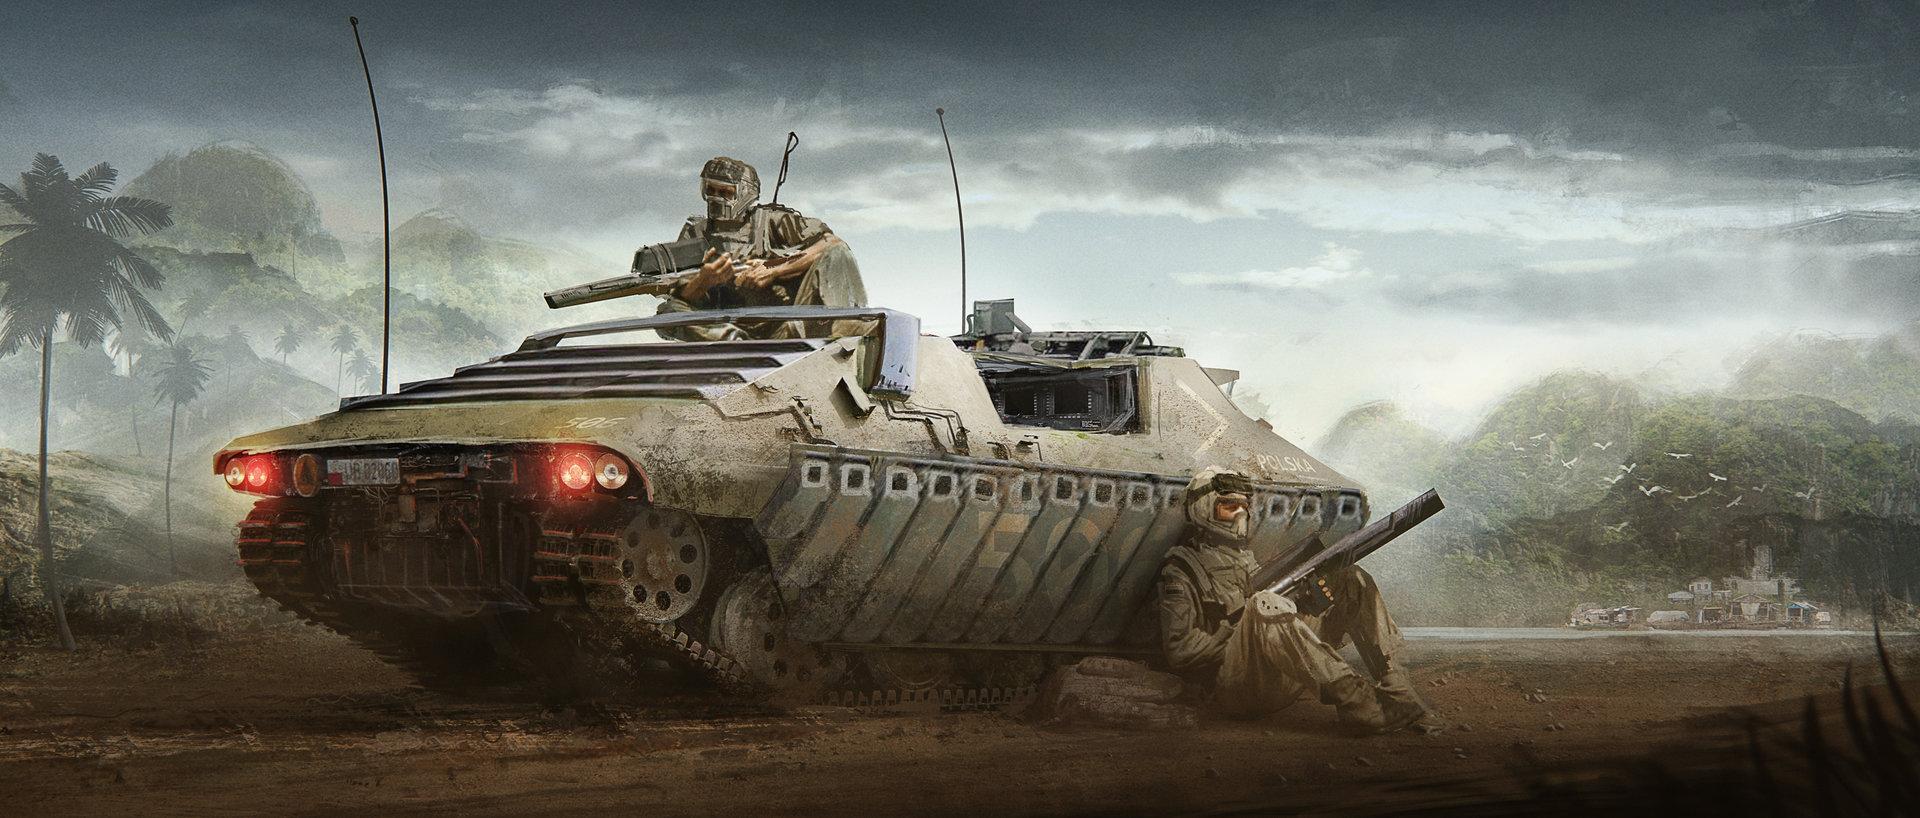 Artstation Recon Tank Concept Nick Foreman